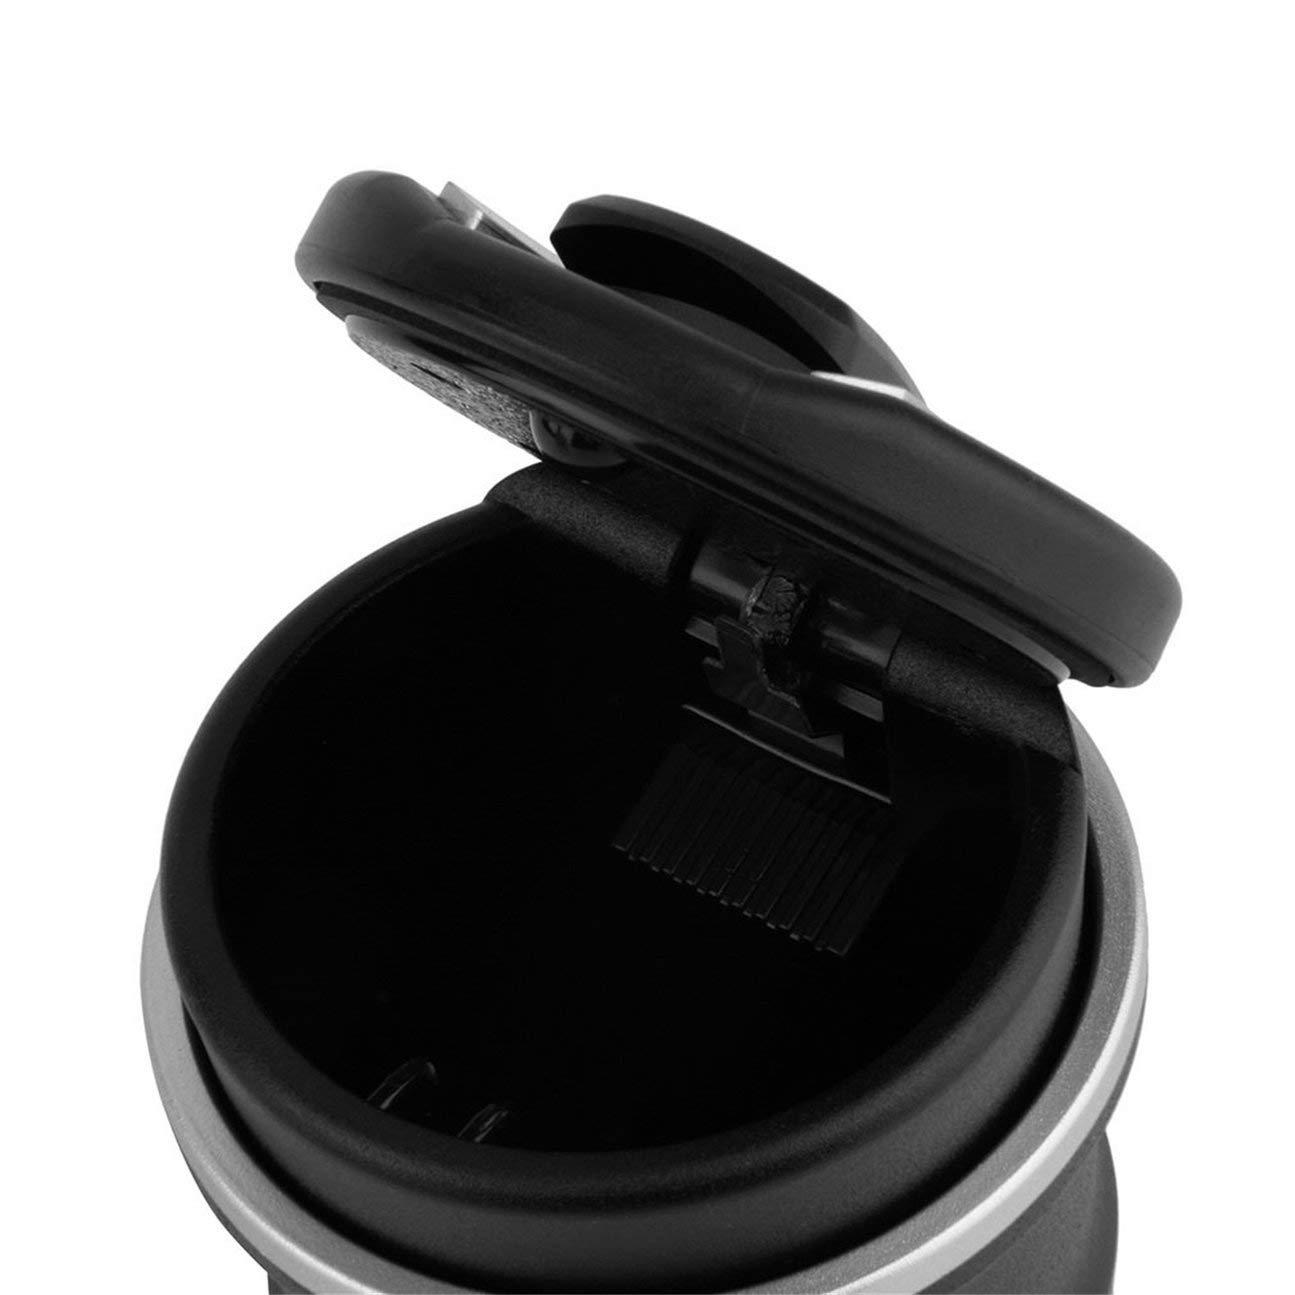 negro Bandeja de ceniza del coche de material pl/ástico ign/ífugo Cenicero Taza de almacenamiento con LED para BMW 1 3 4 5 7 Serie X1 X3 X5 X6